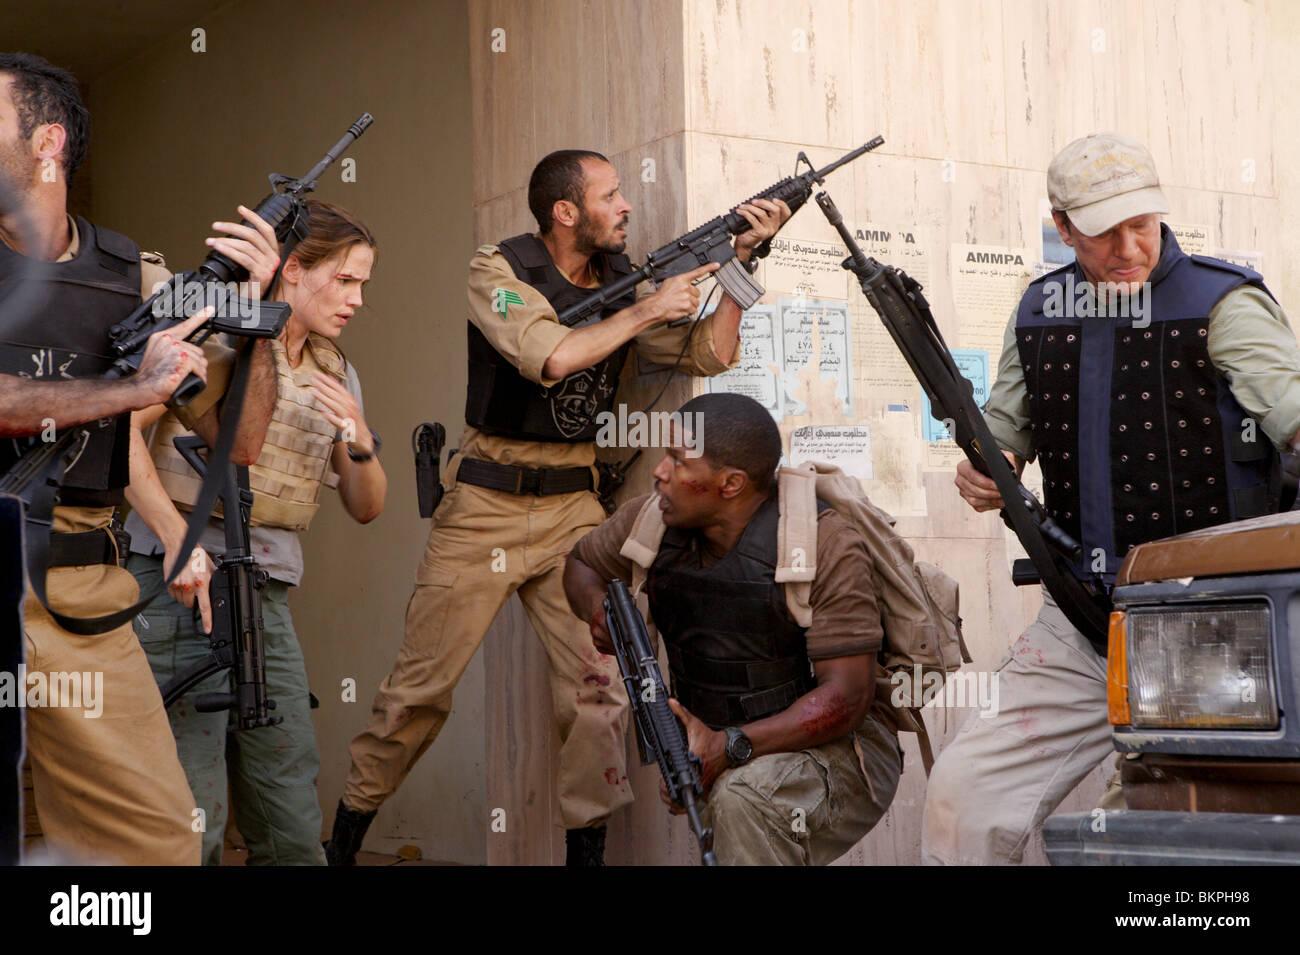 Il Regno (2007) JANET MAYES, Ali Suliman, Jamie Foxx, Chris Cooper PETER BERG (DIR) TKIN 001 Immagini Stock